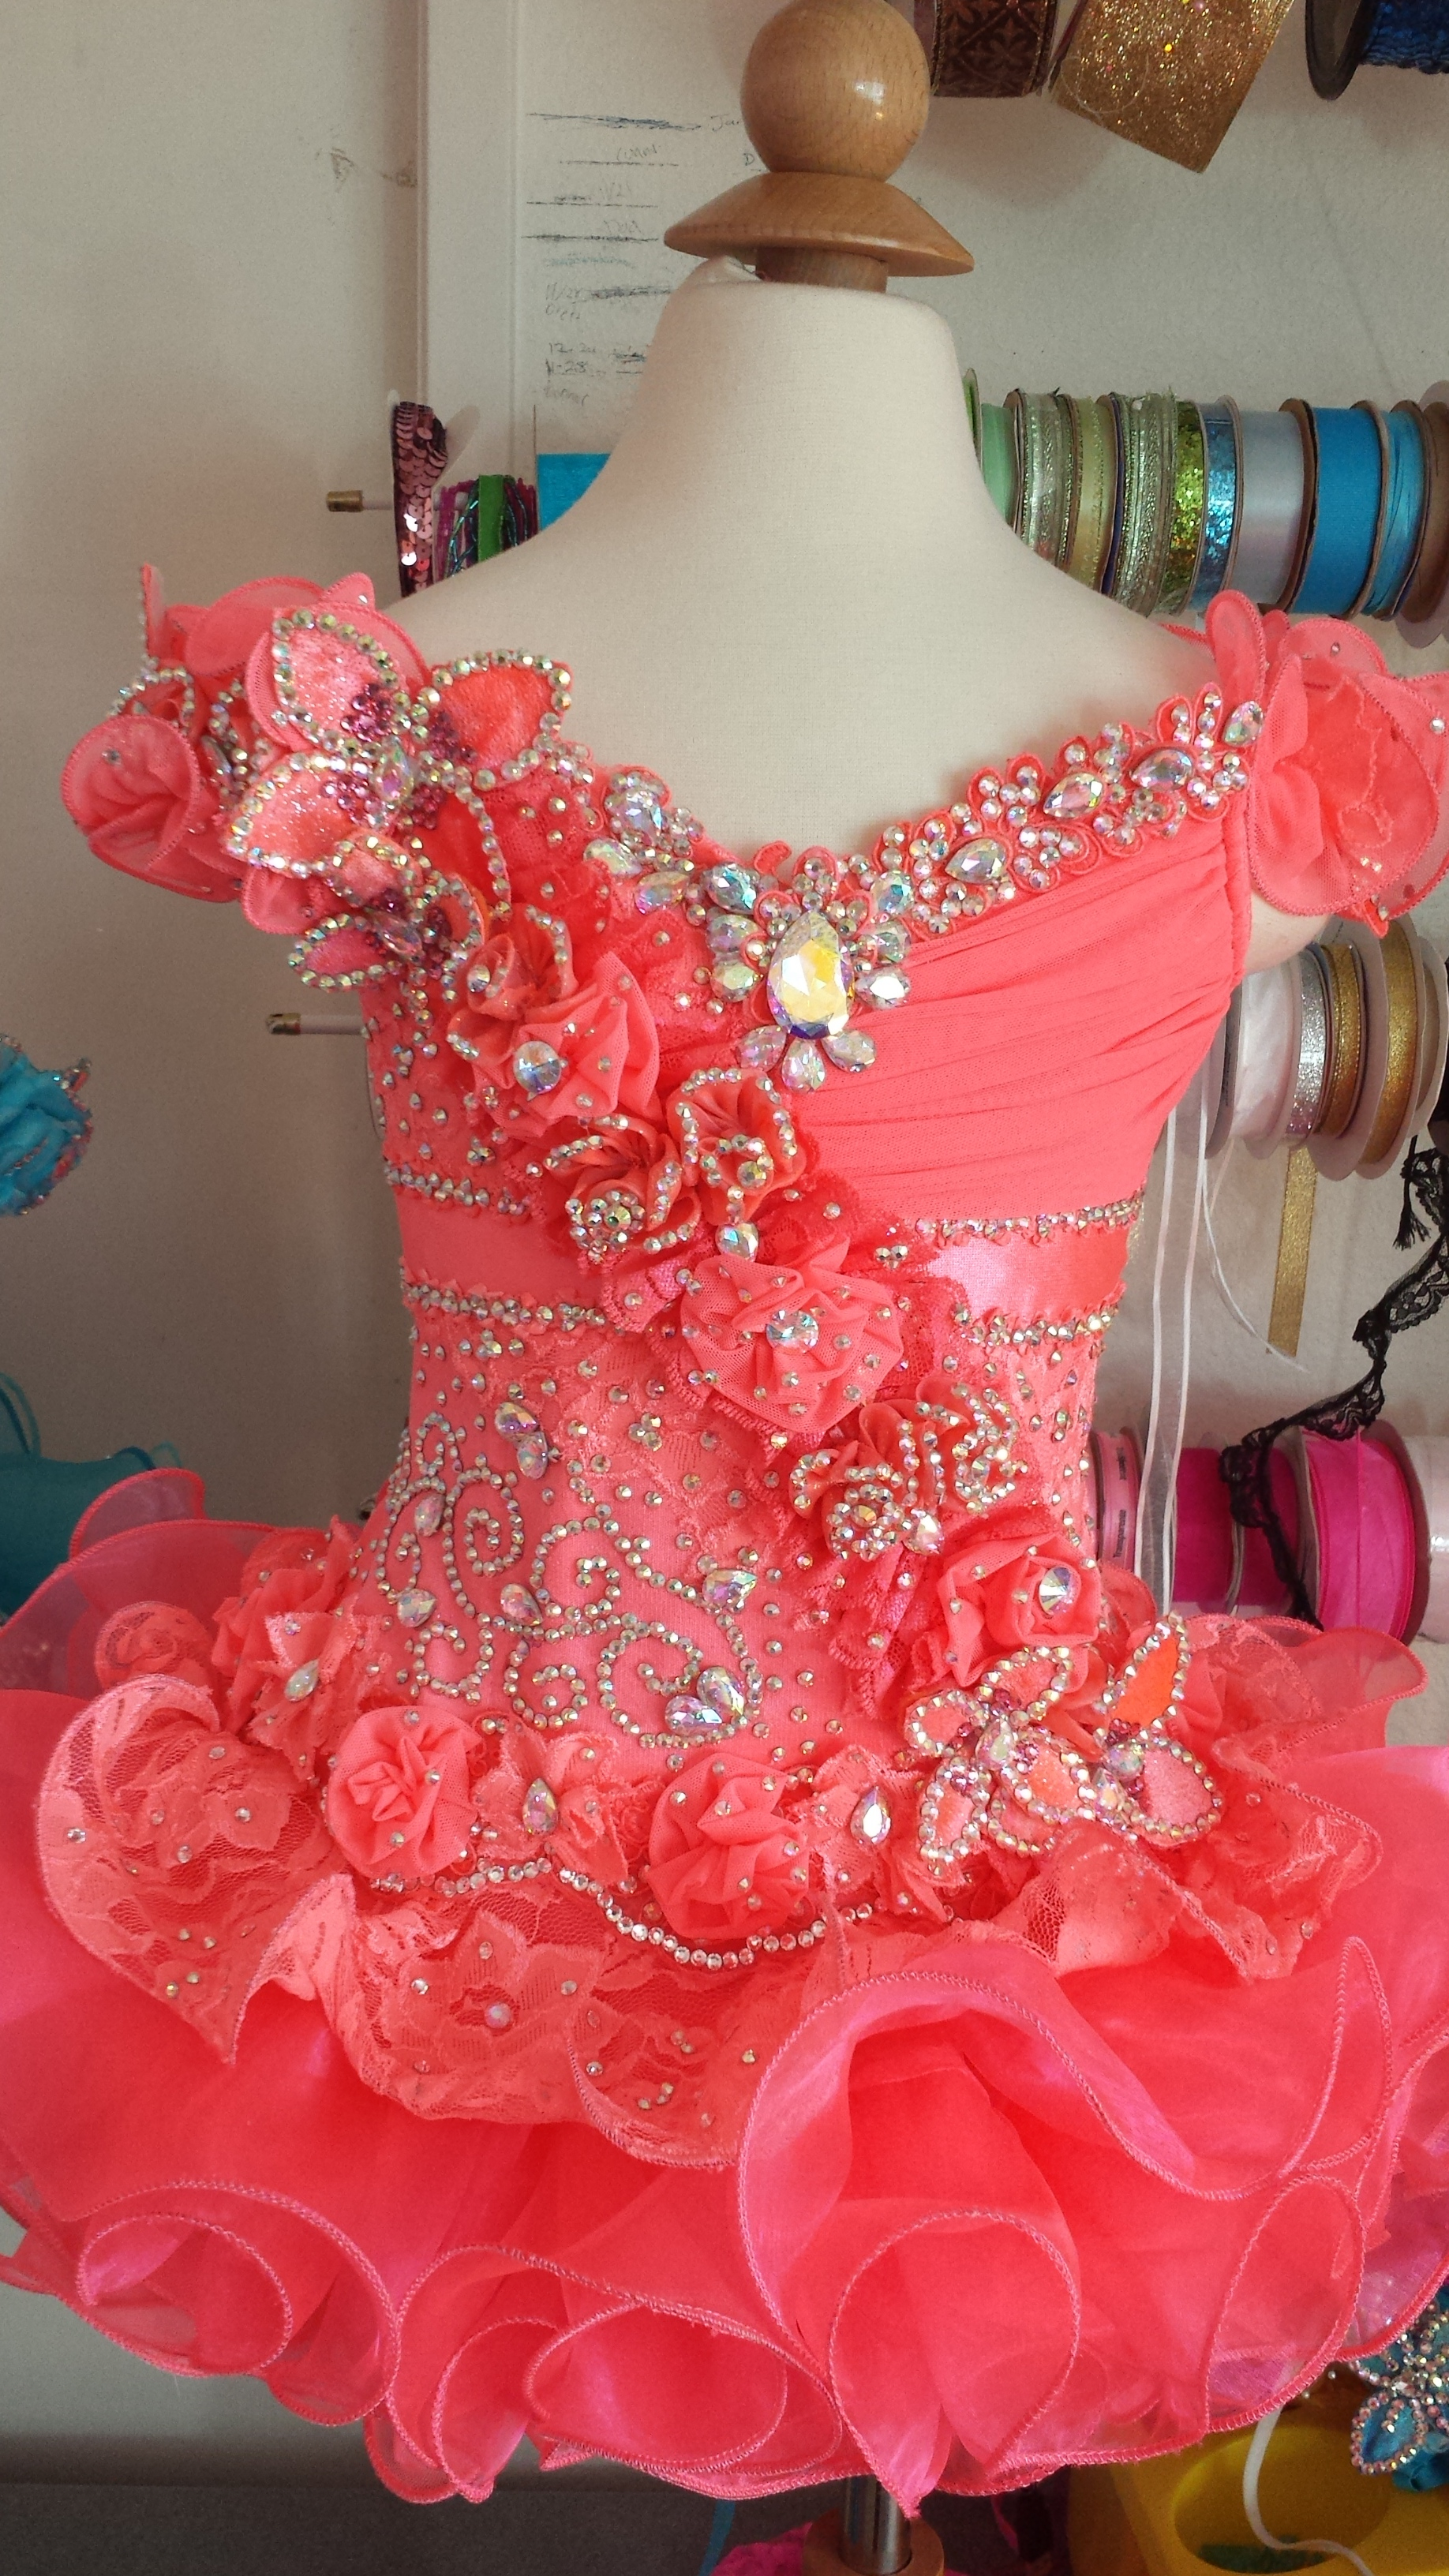 Glitz pageant dresses for rent - 20130710_124542 Jpg